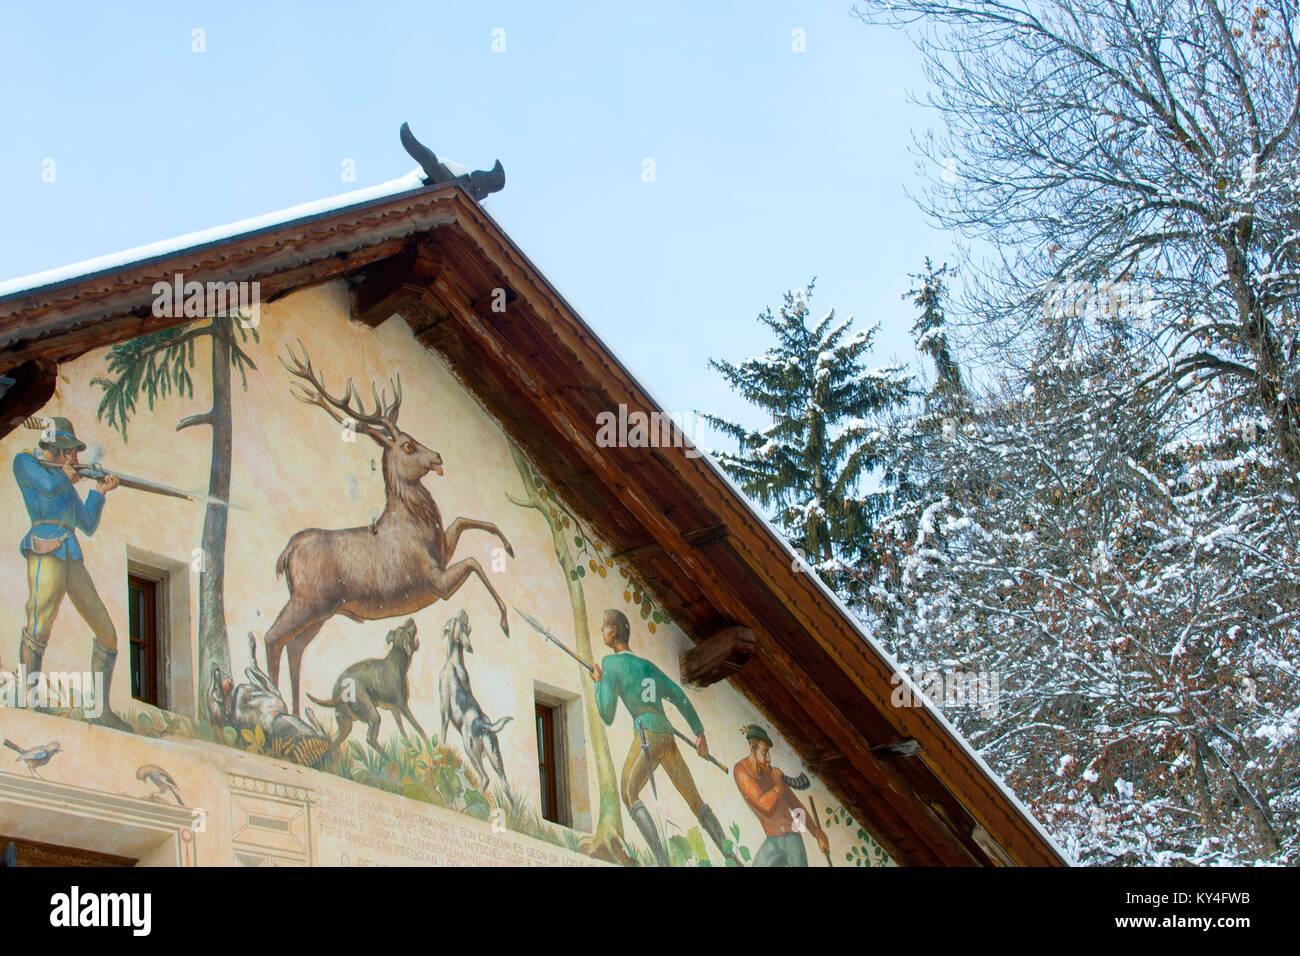 Schweiz, Engadin, Sent bei Bad Scuol, Chasa dal Chatchaders - Stock Image